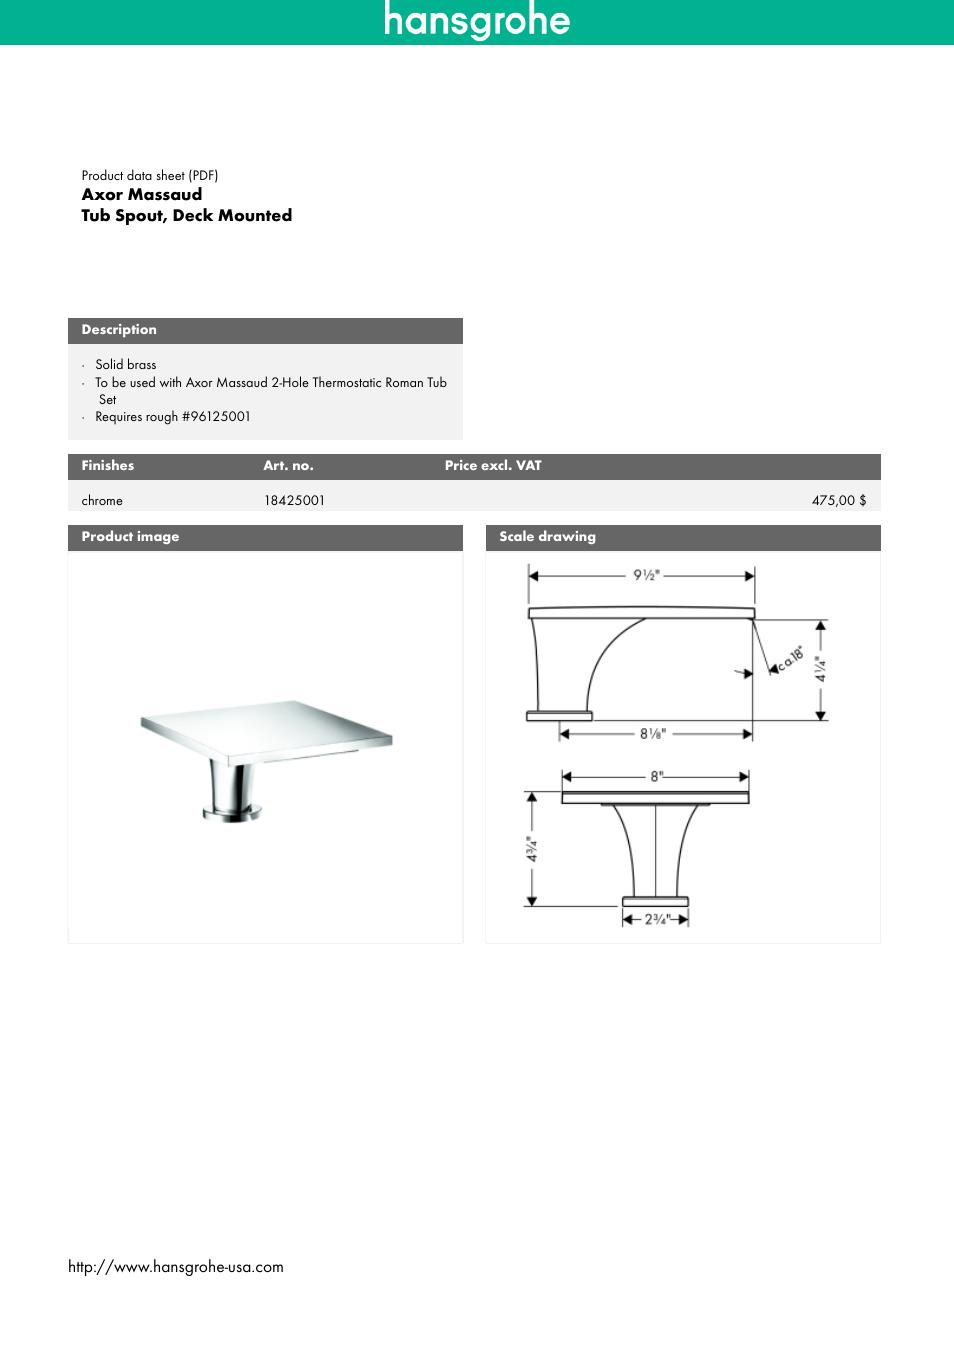 Factory Direct Hardware Hansgrohe 18425001 Axor Massaud User Manual ...